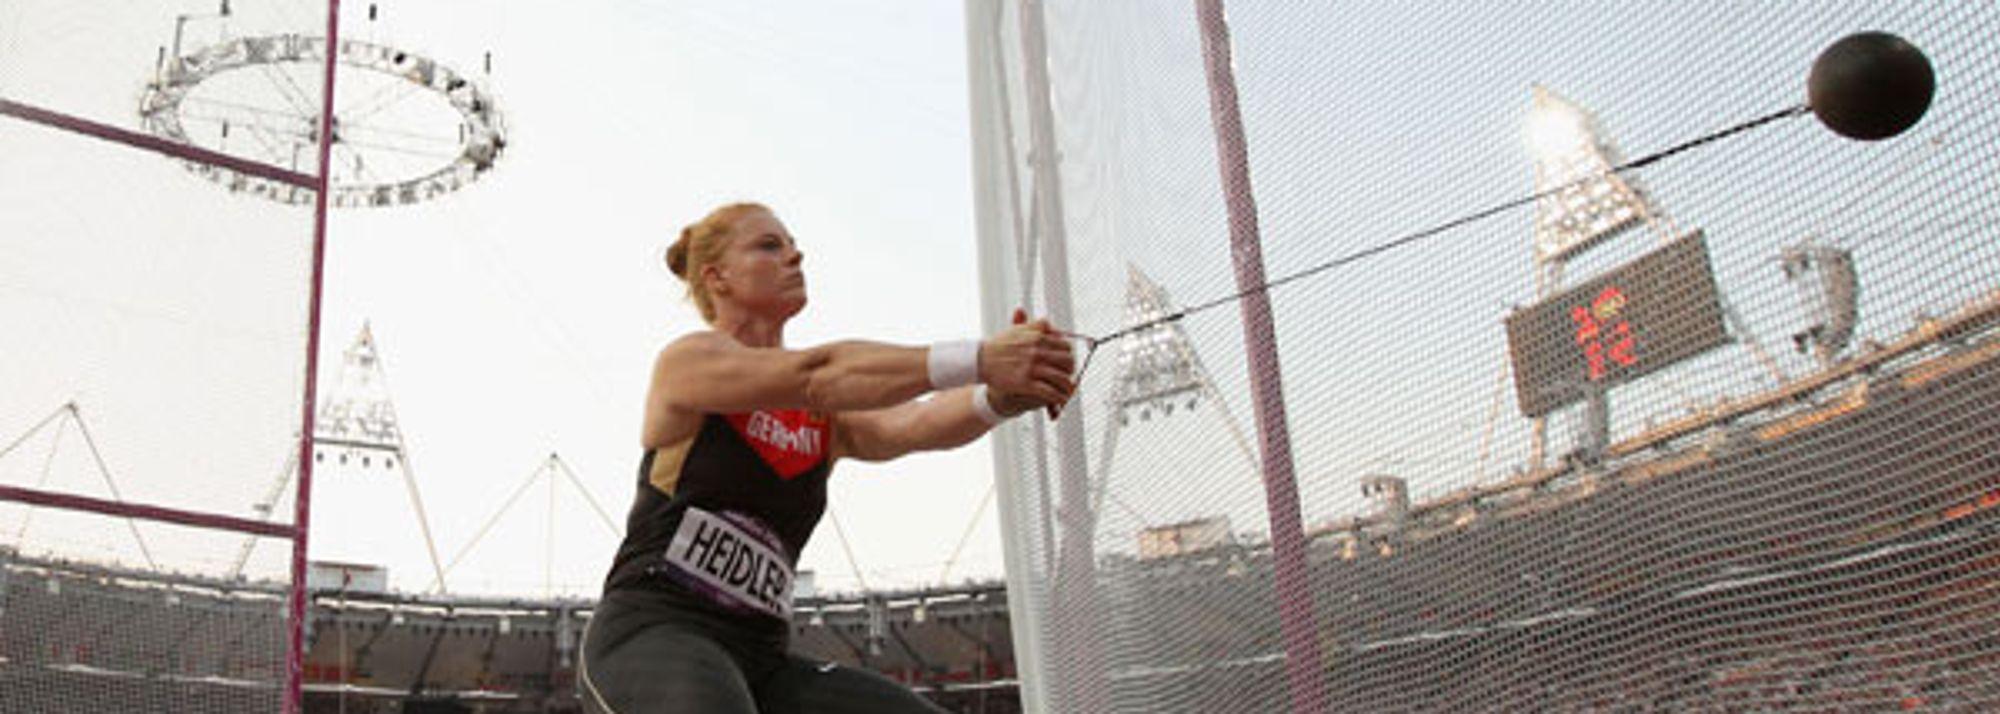 Holloway and Chepkoech look to maintain momentum in Torun